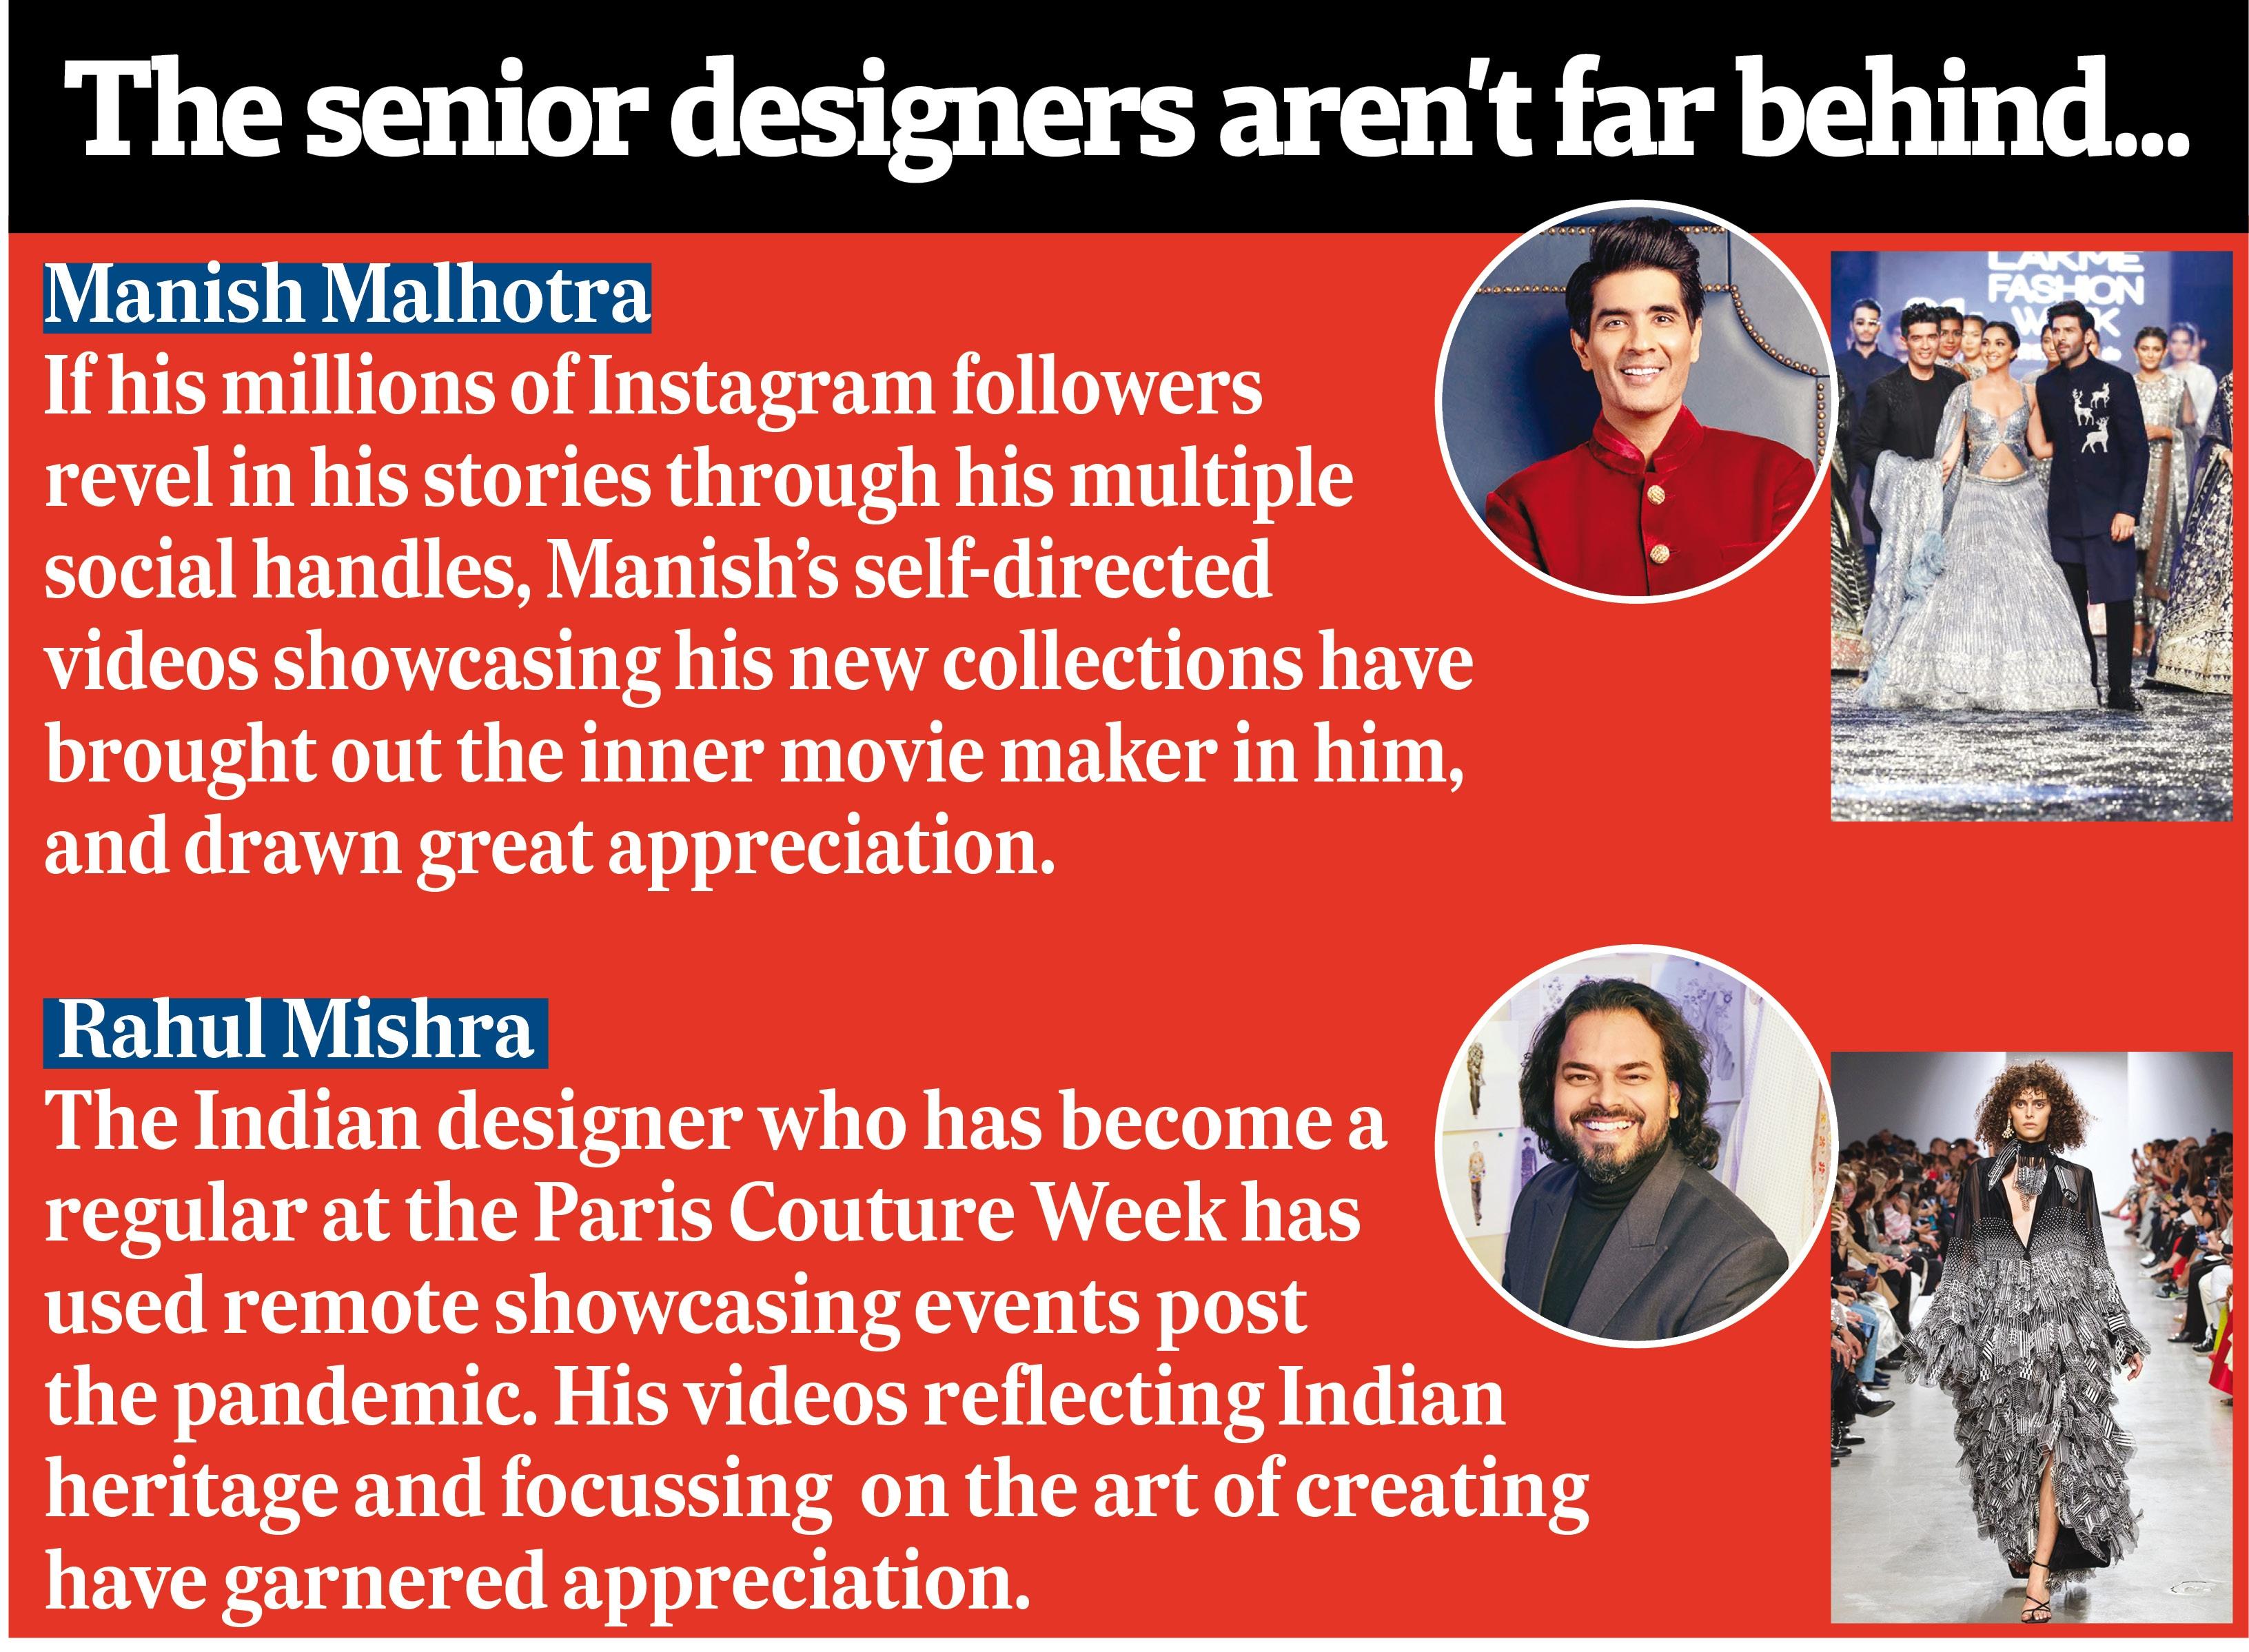 Senior designers acing the social media game